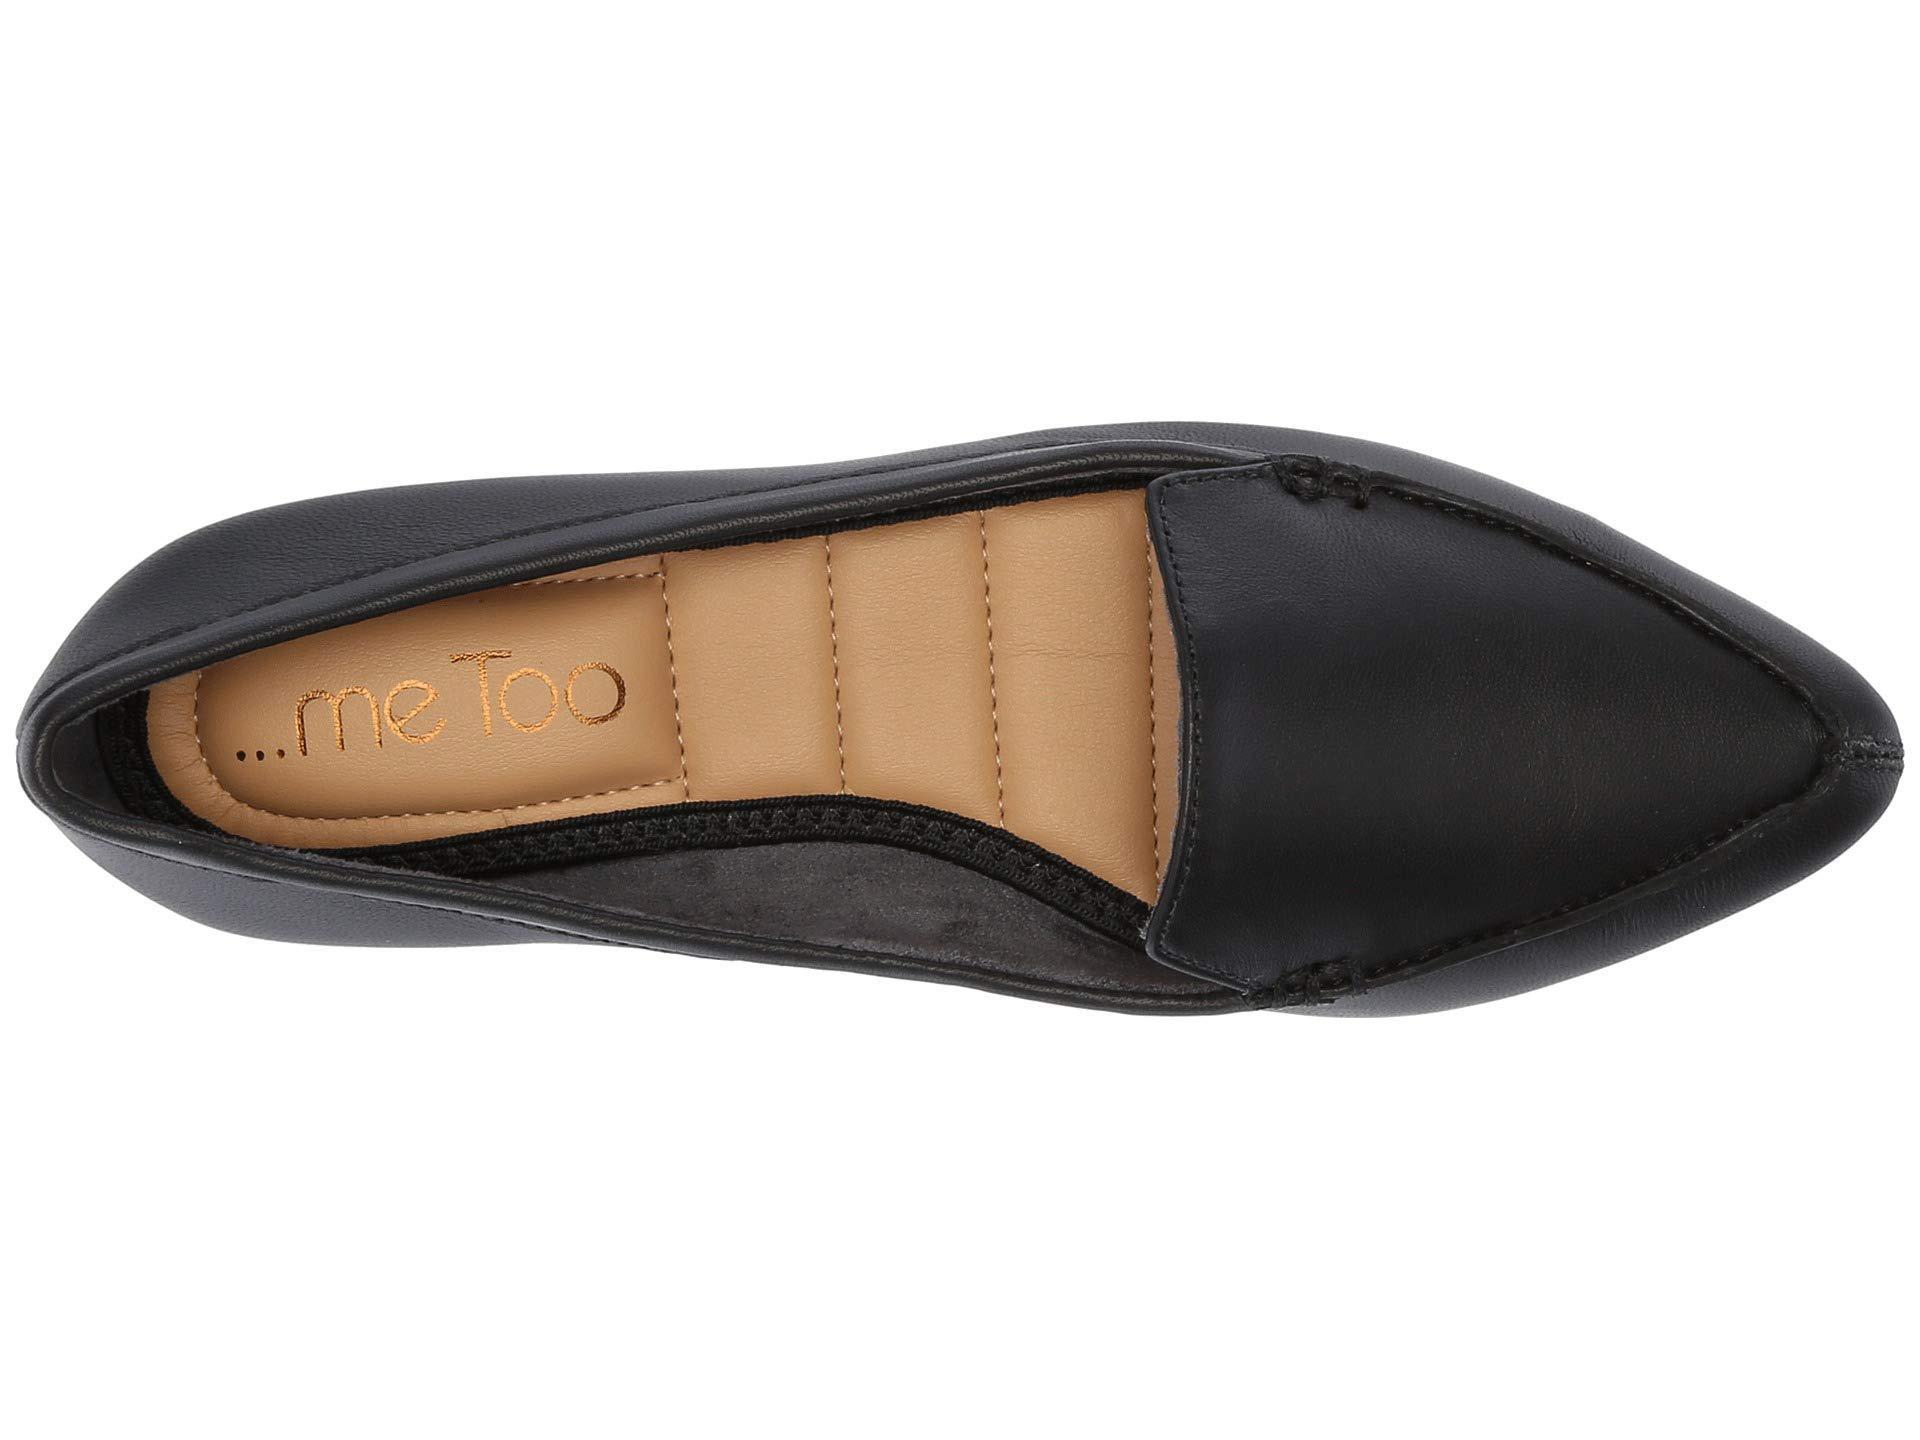 c89fc40769b Me Too - Black Audra (tan Large Print Jaguar) Women s Shoes - Lyst. View  fullscreen